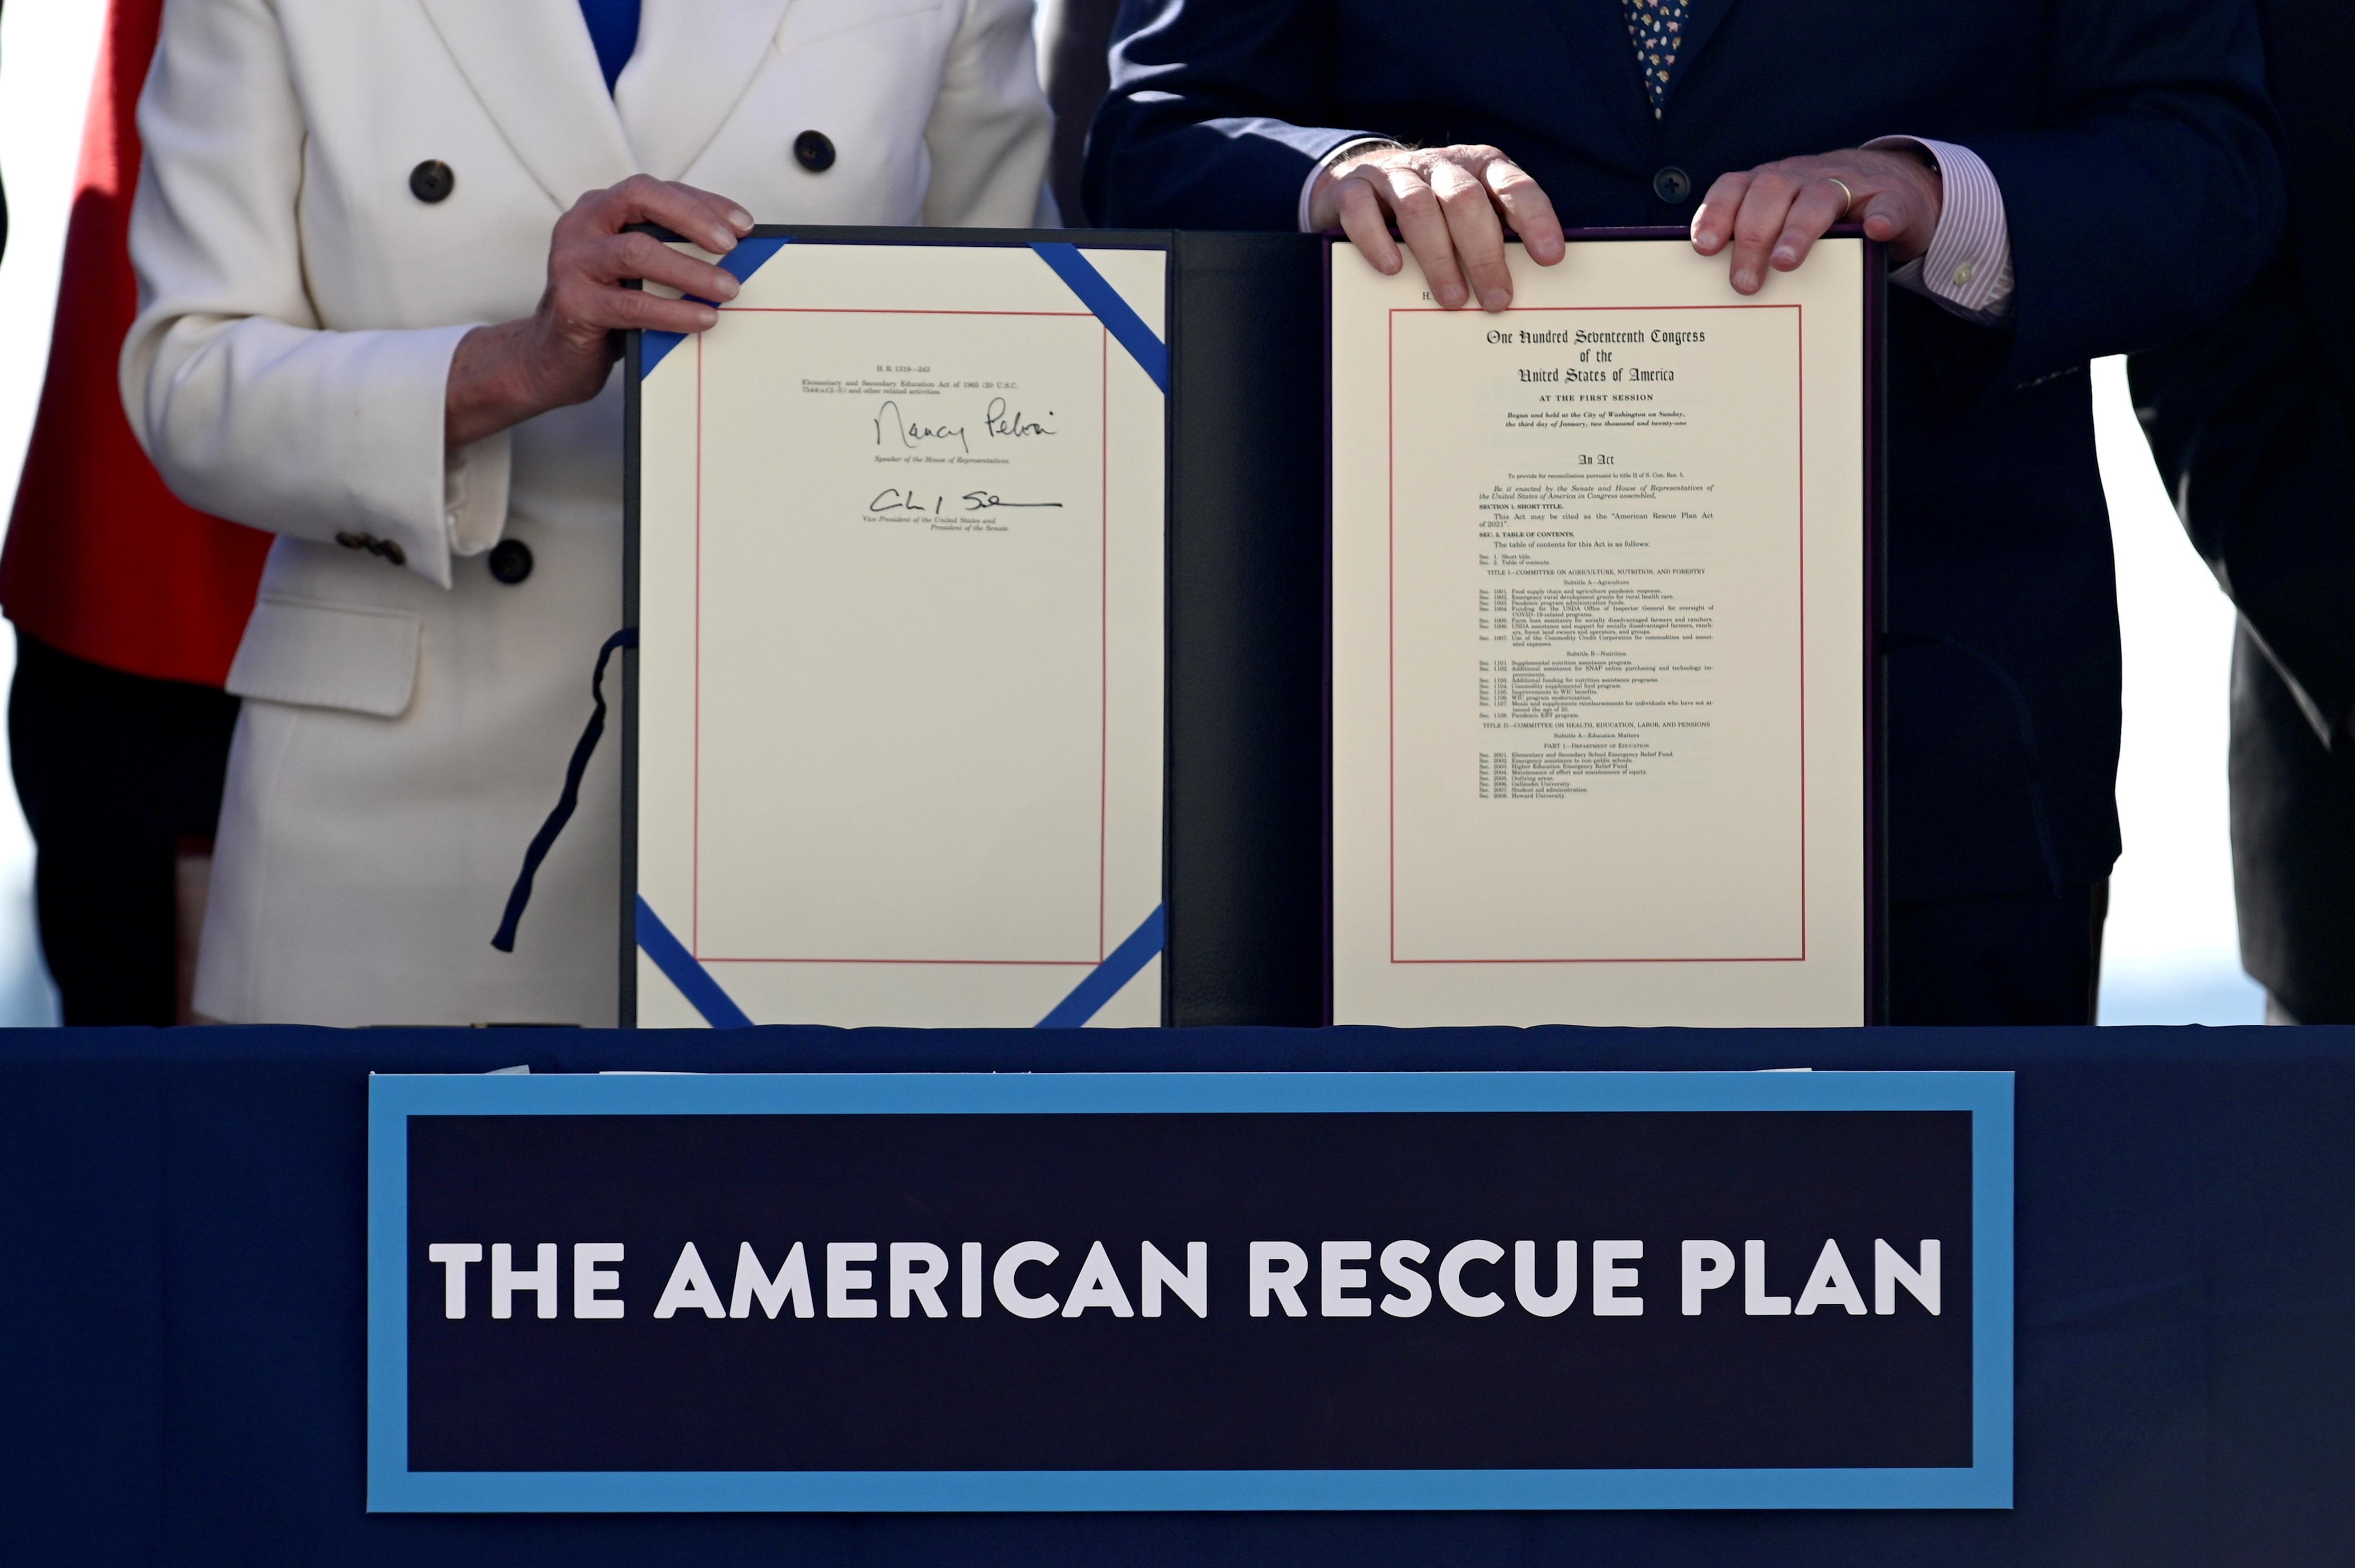 House Speaker Nancy Pelosi (D-CA) and Senate Majority Leader Chuck Schumer display the